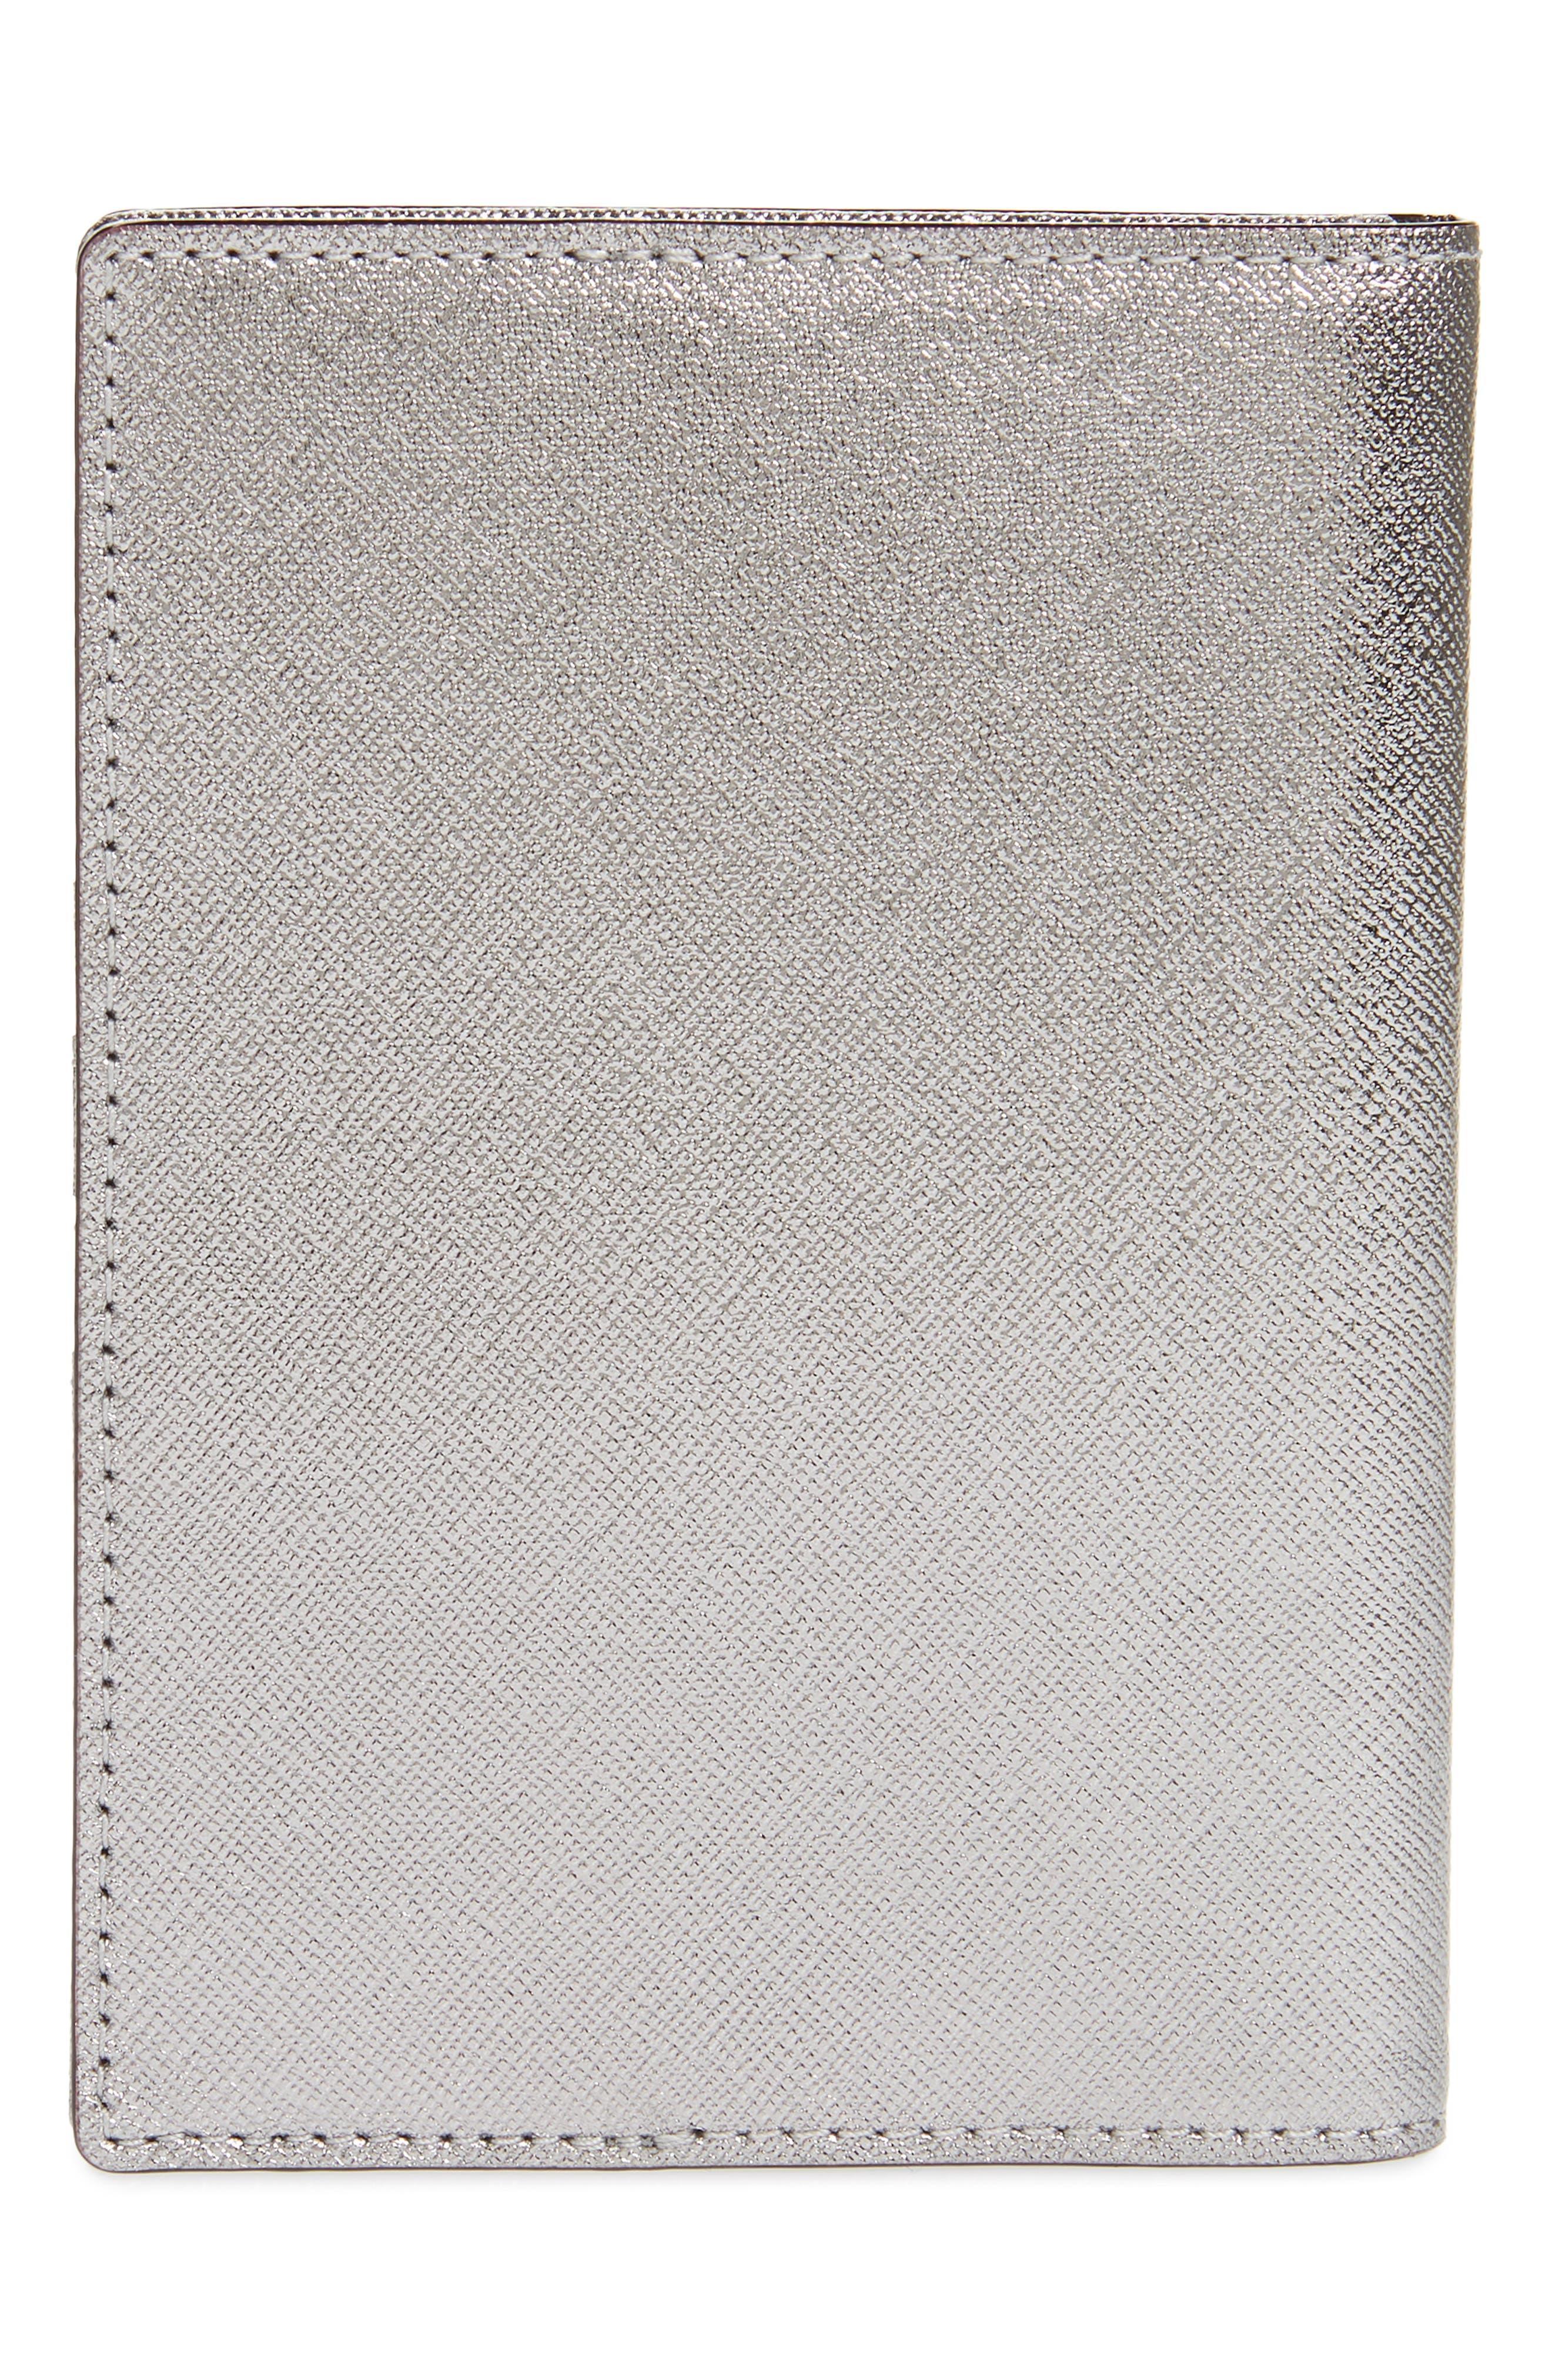 'cameron street' leather passport holder,                             Alternate thumbnail 4, color,                             040